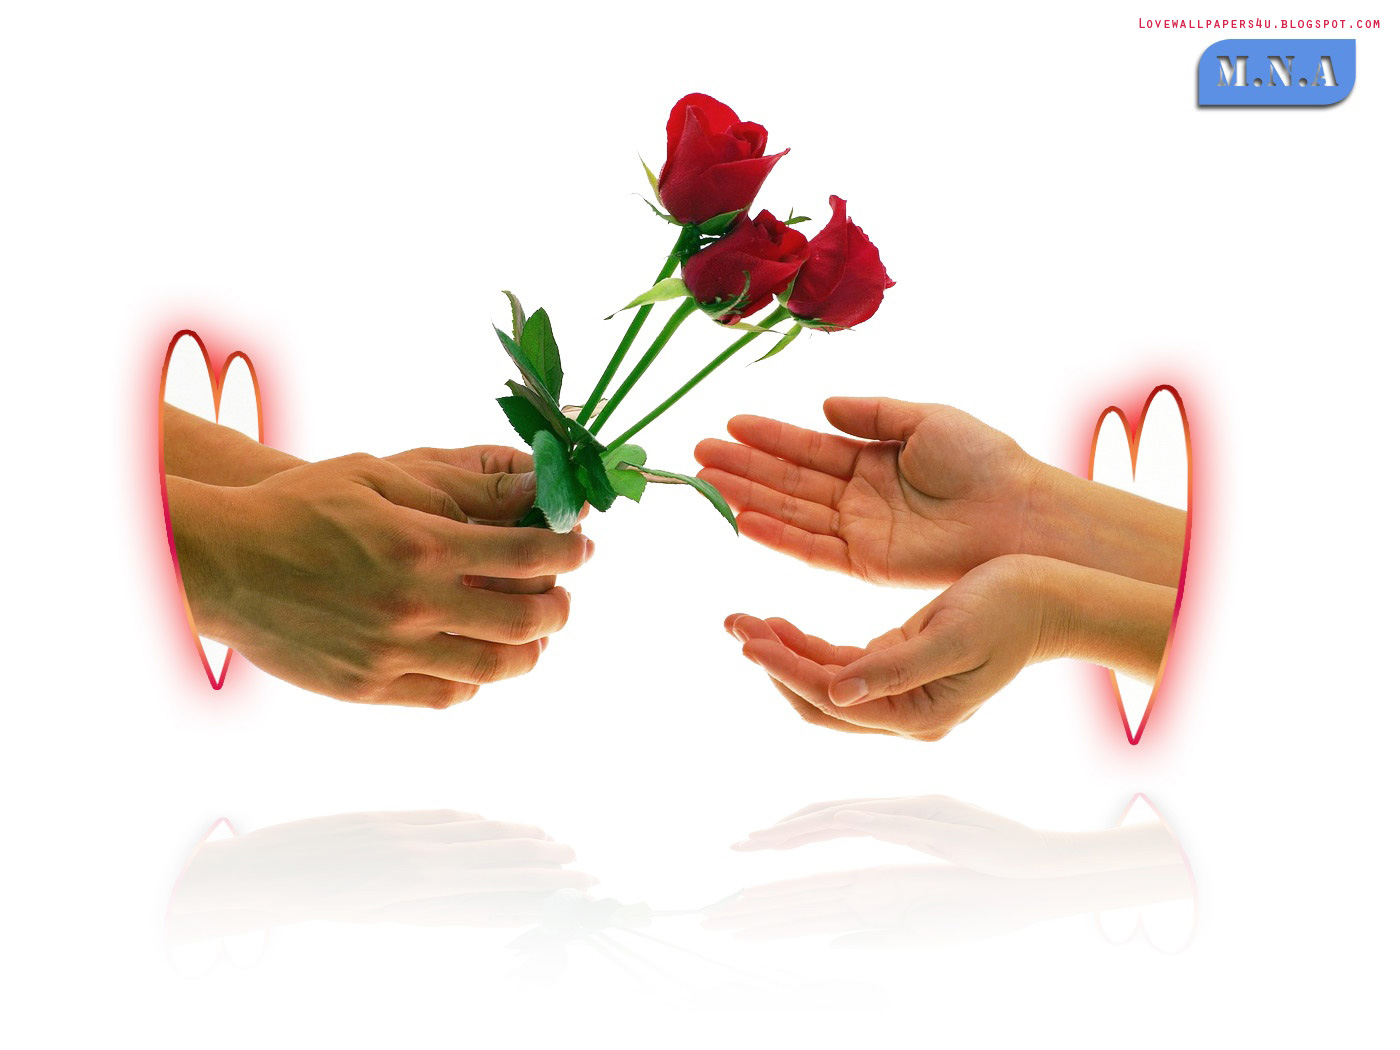 http://2.bp.blogspot.com/-NSVxuosaEJM/T7295itBvII/AAAAAAAAAfM/q9yRPUHWXD4/s1600/Free_love-wallpapers..jpg